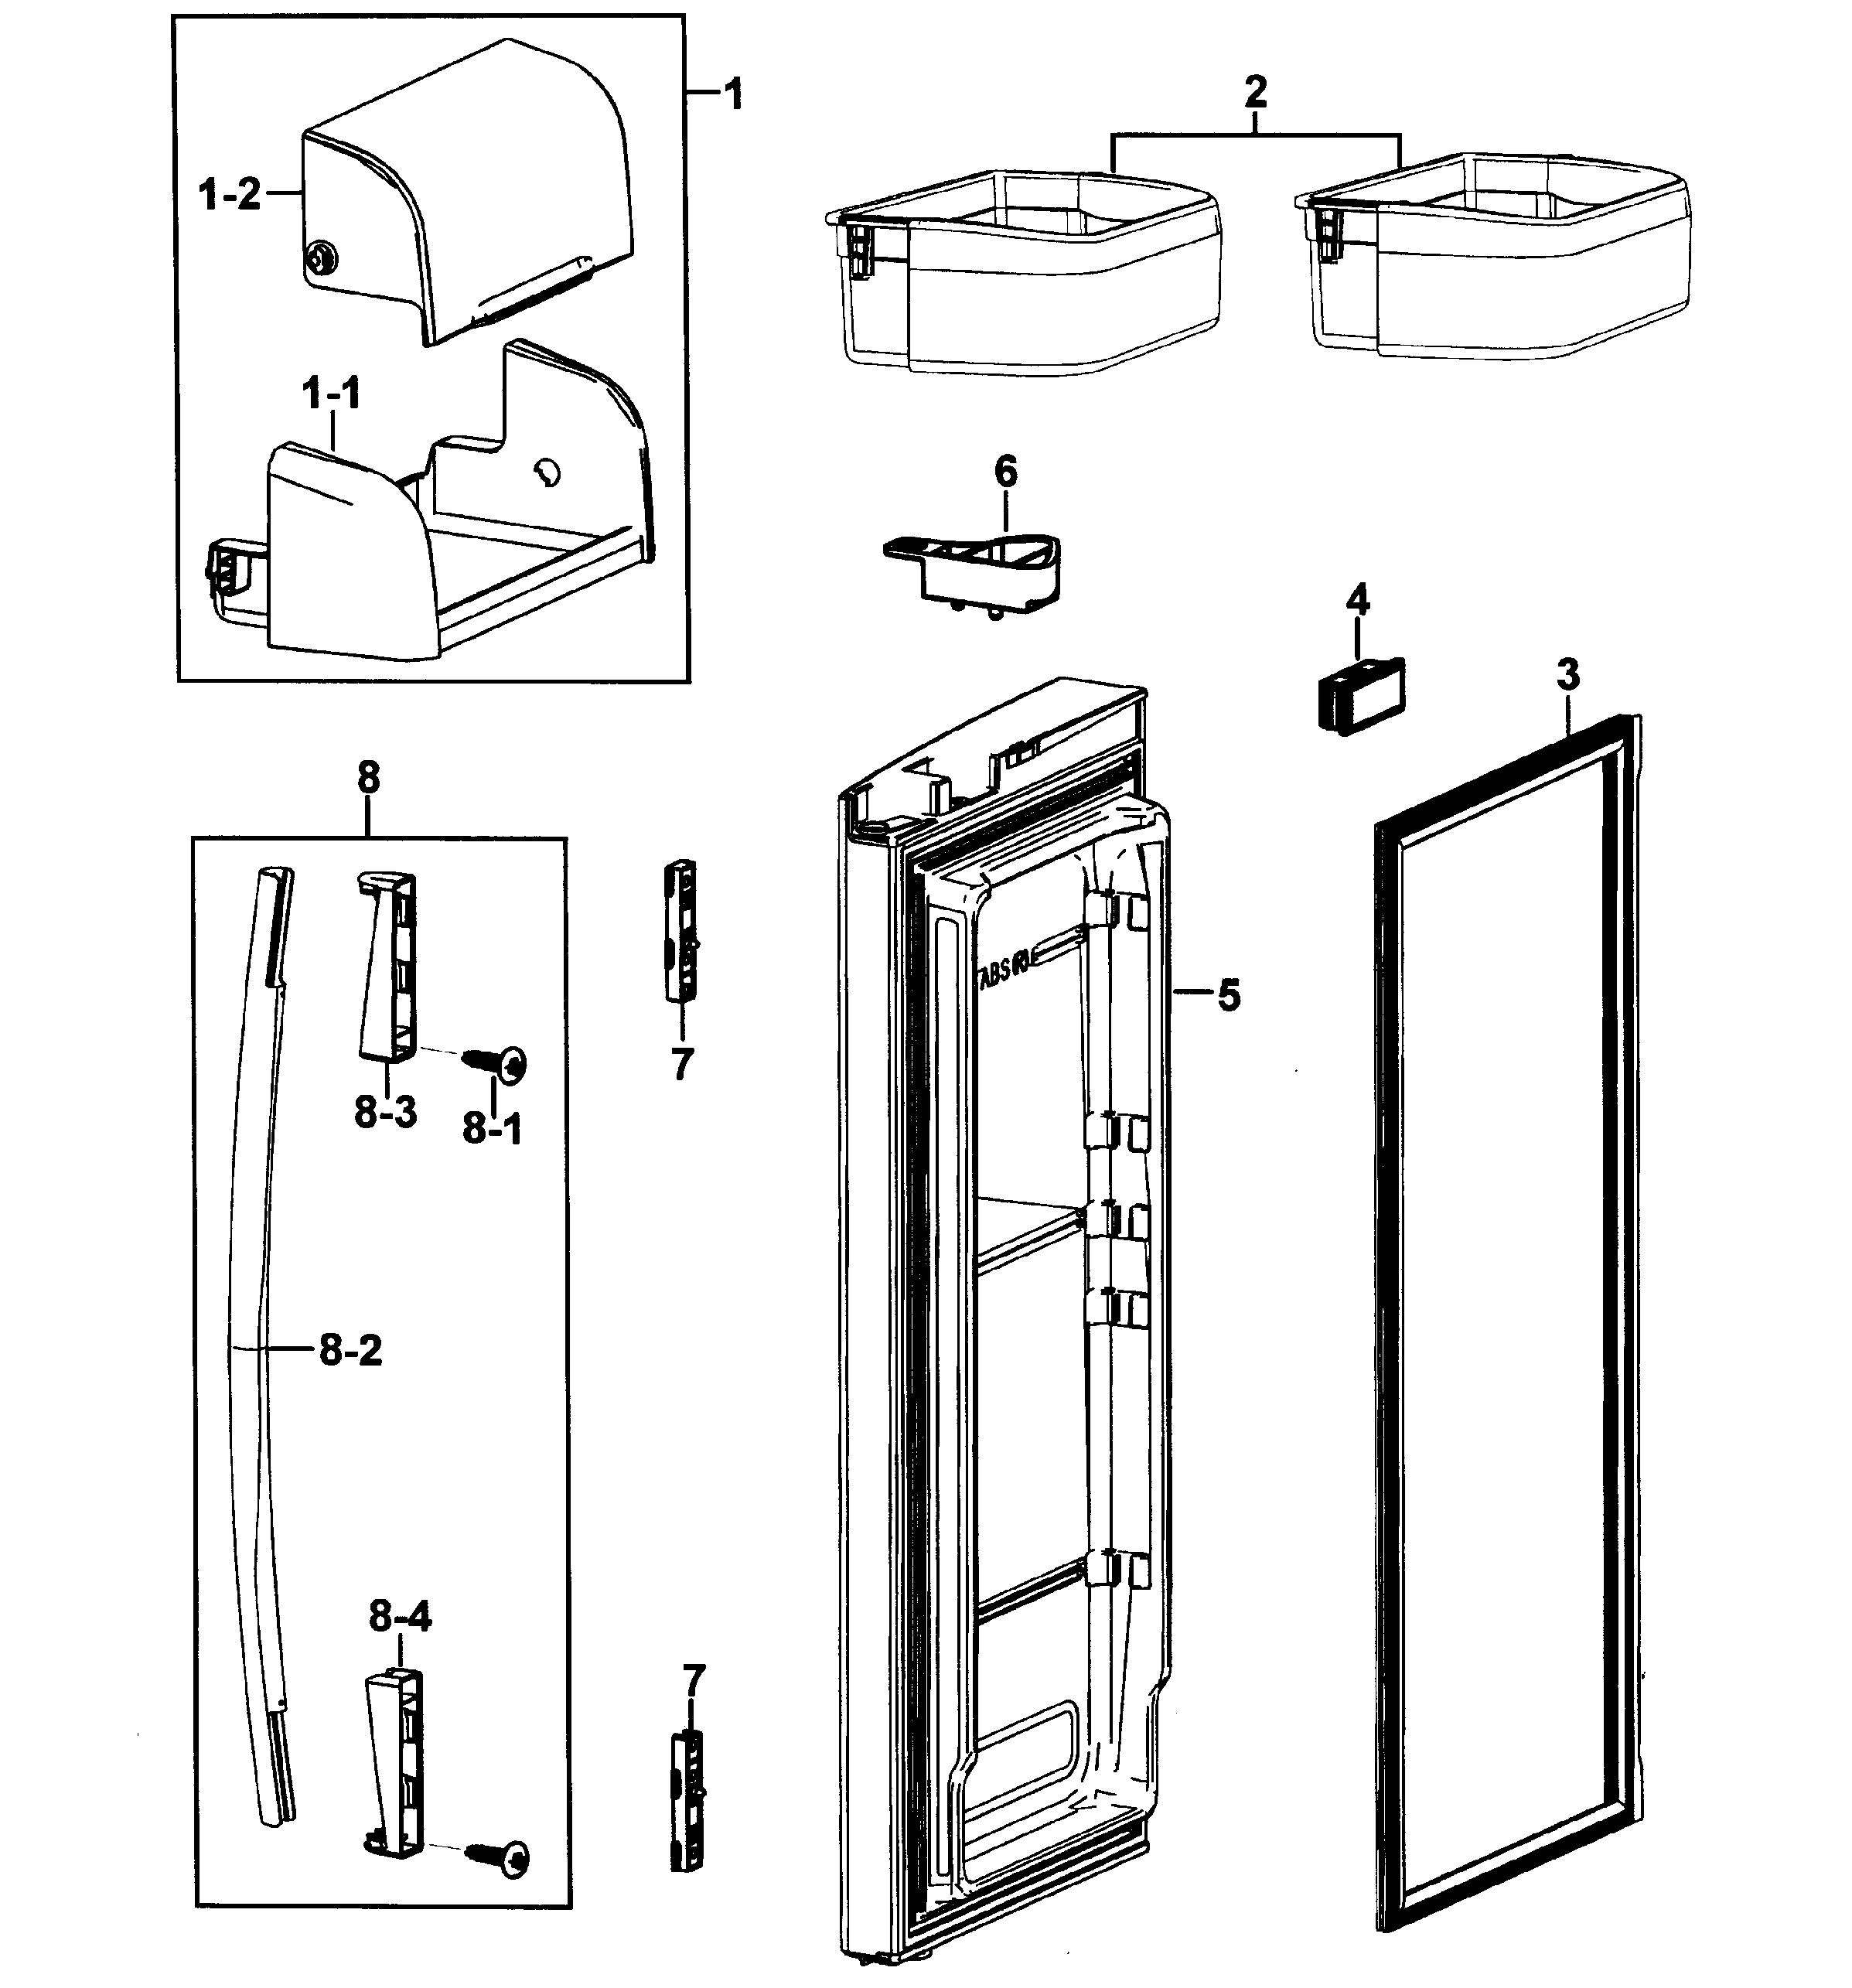 whirlpool frost refrigerator wiring diagram